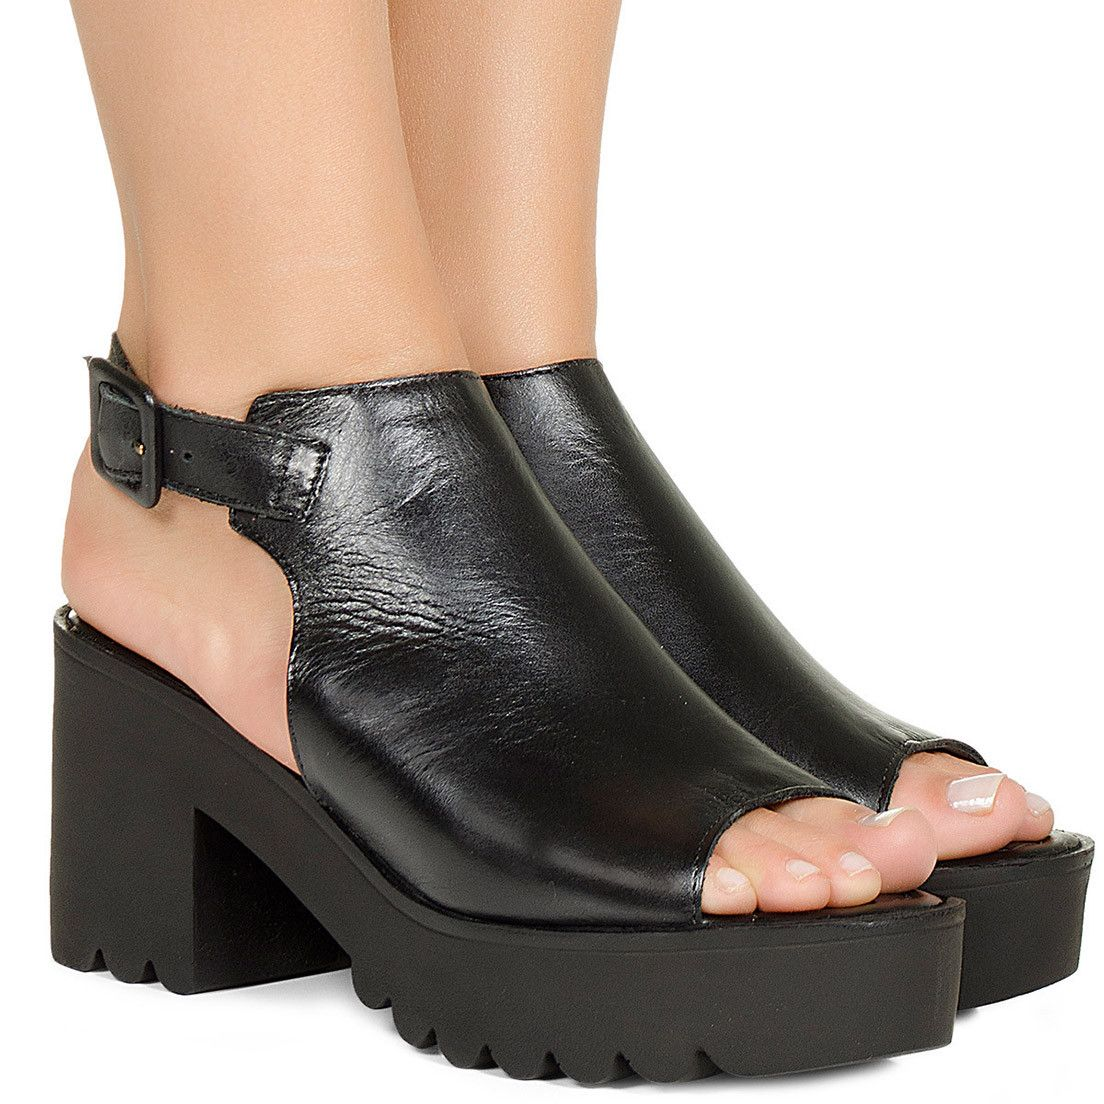 230618d823 Sandalia flatform preta tratorada Taquilla - Taquilla  Calçados femininos  online